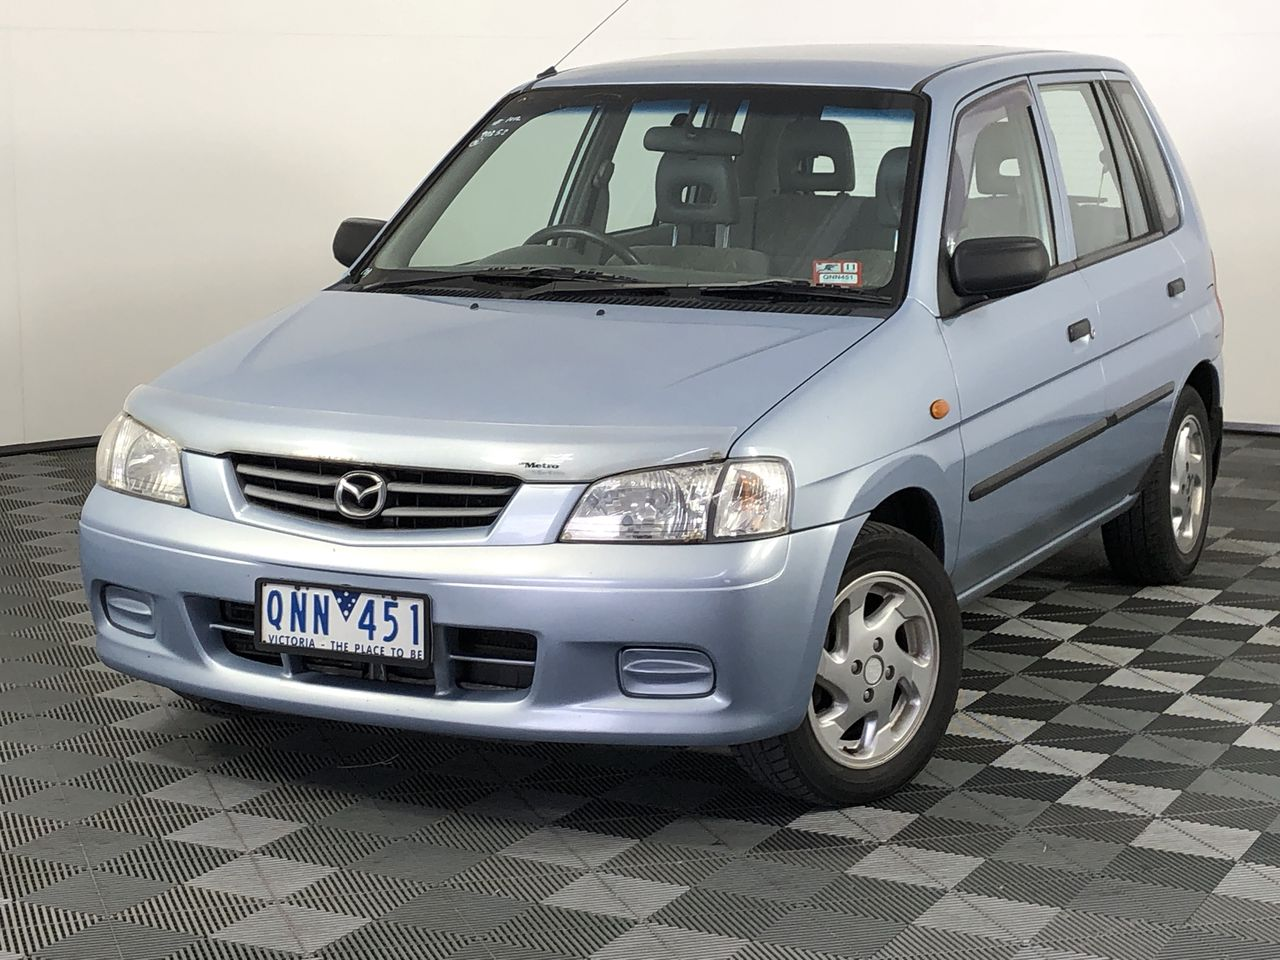 2000 Mazda 121 Metro Shades DW Manual Hatchback